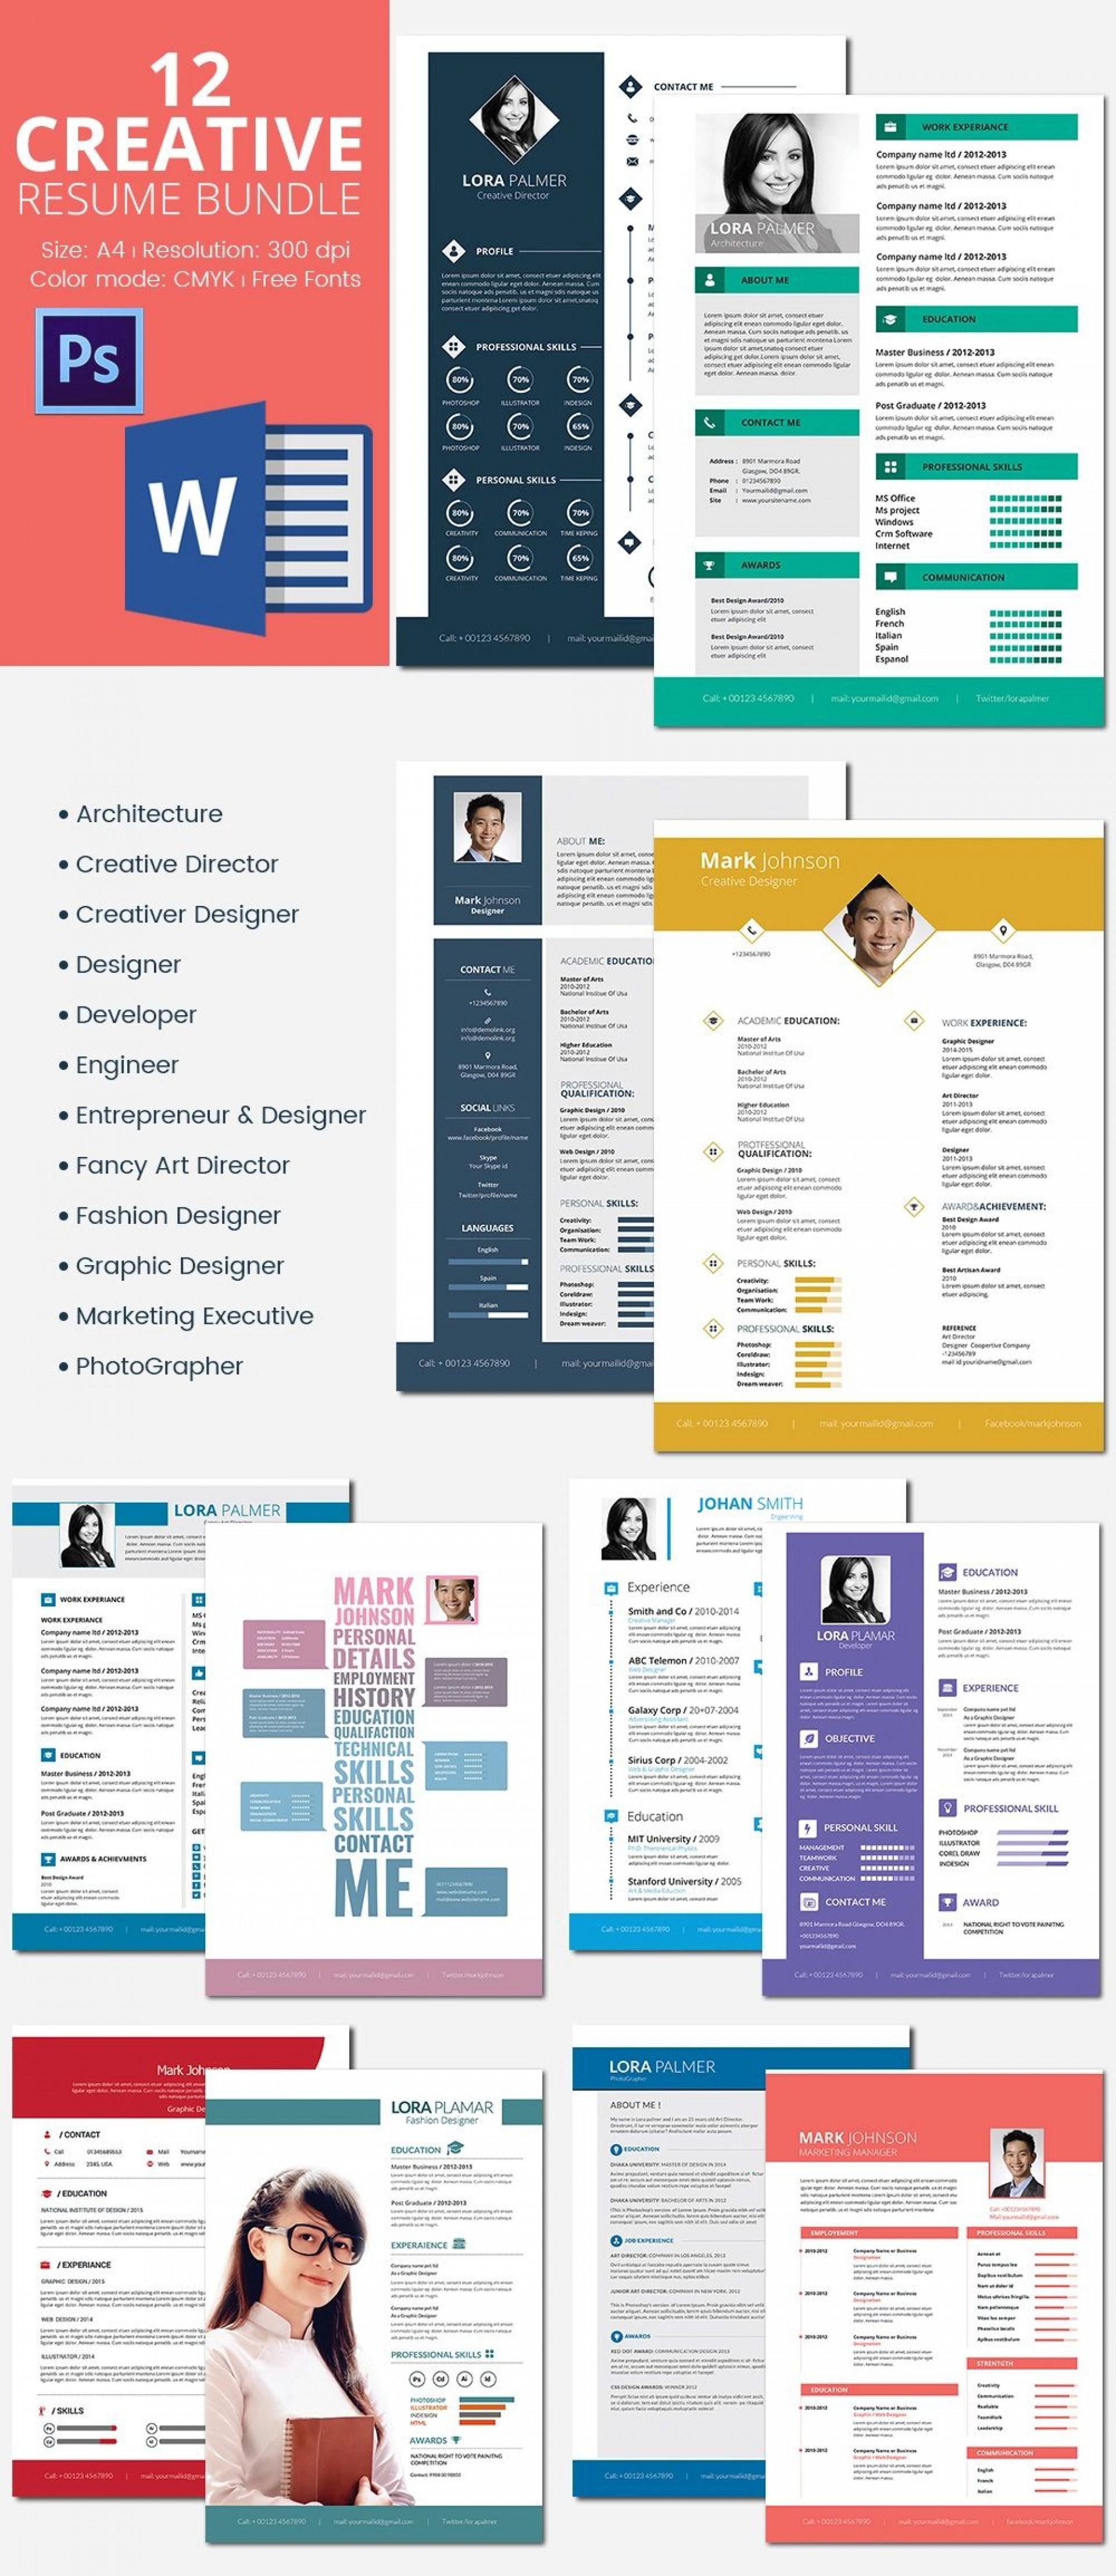 001 Dreaded Software Engineering Resume Template Inspiration  Engineer Microsoft Word Cv Free Developer Download1920